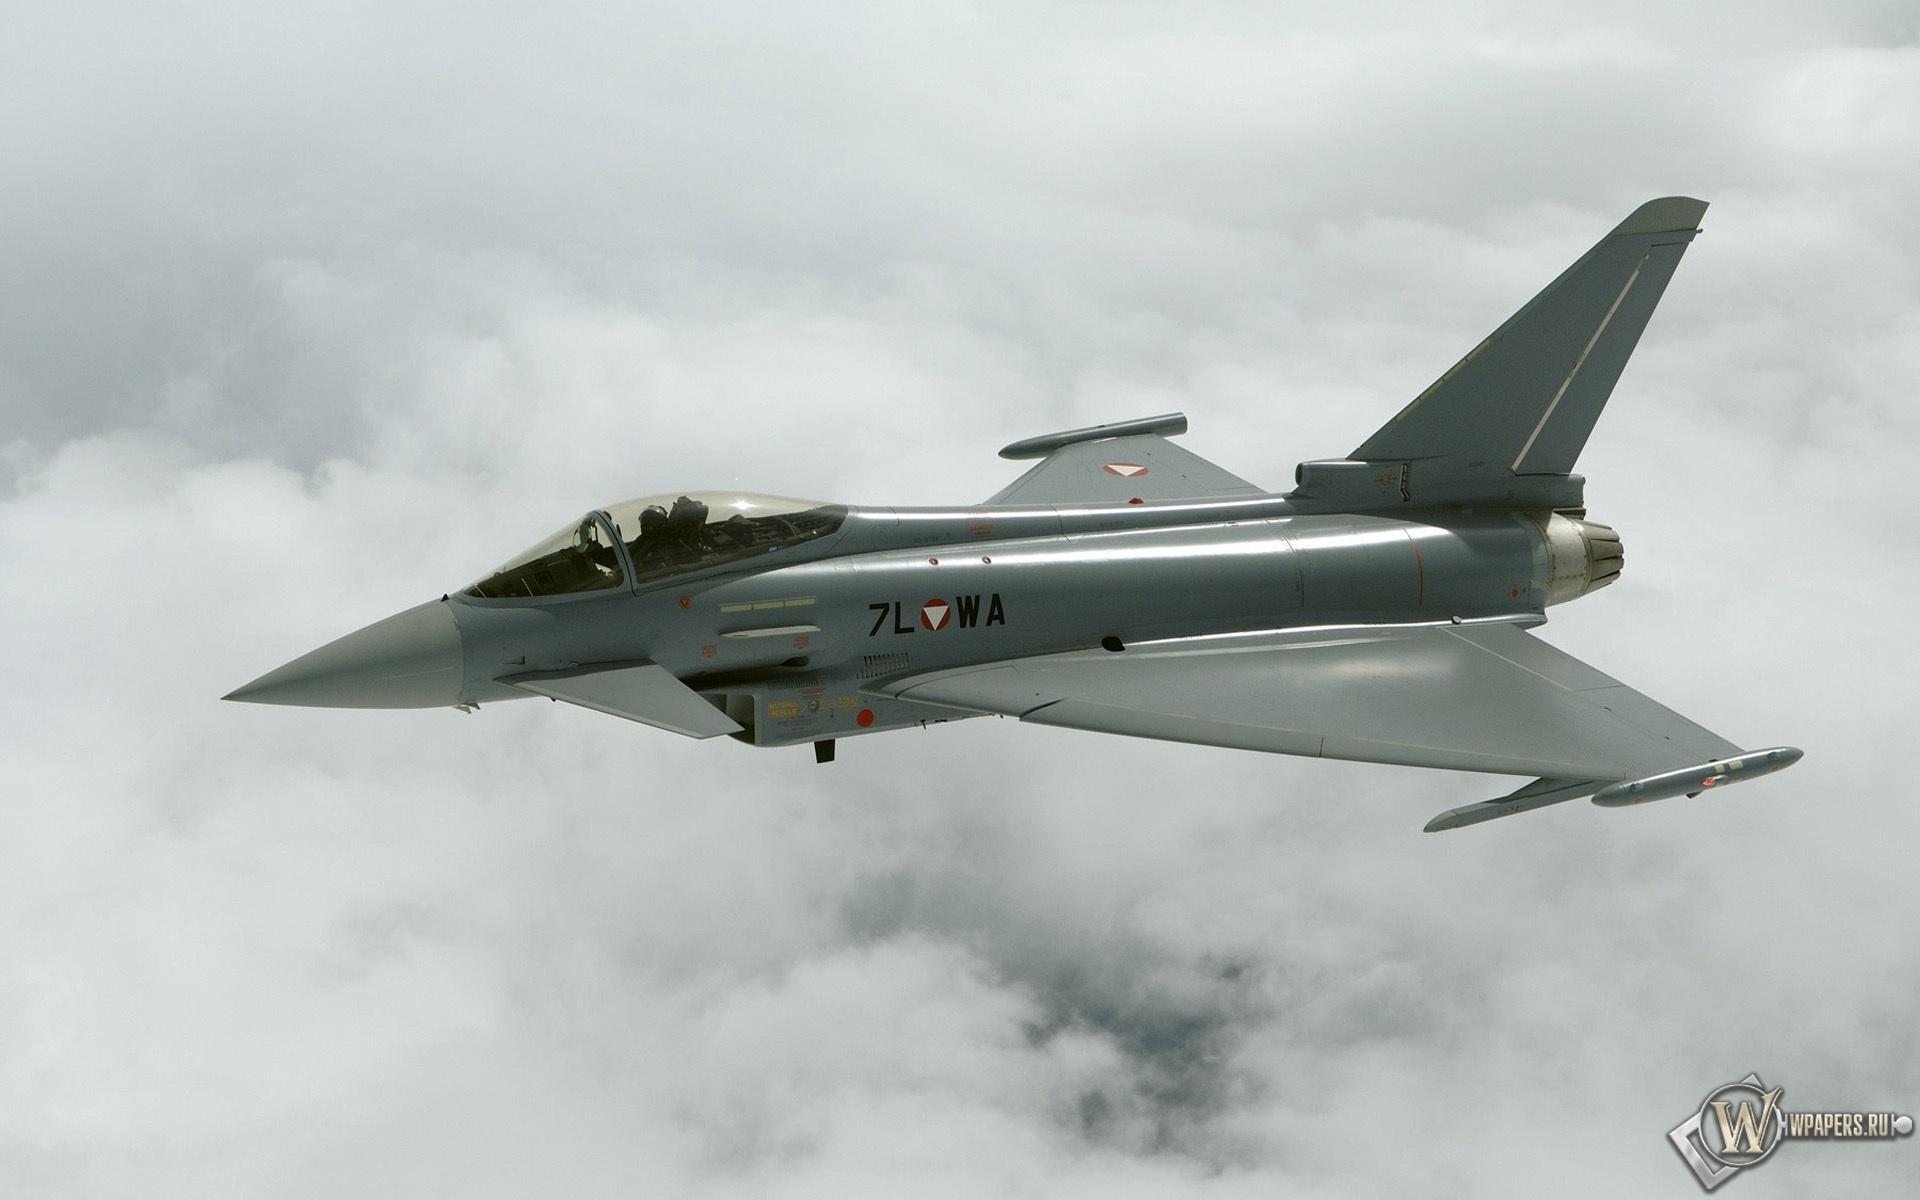 Eurofighter 2000 1920x1200